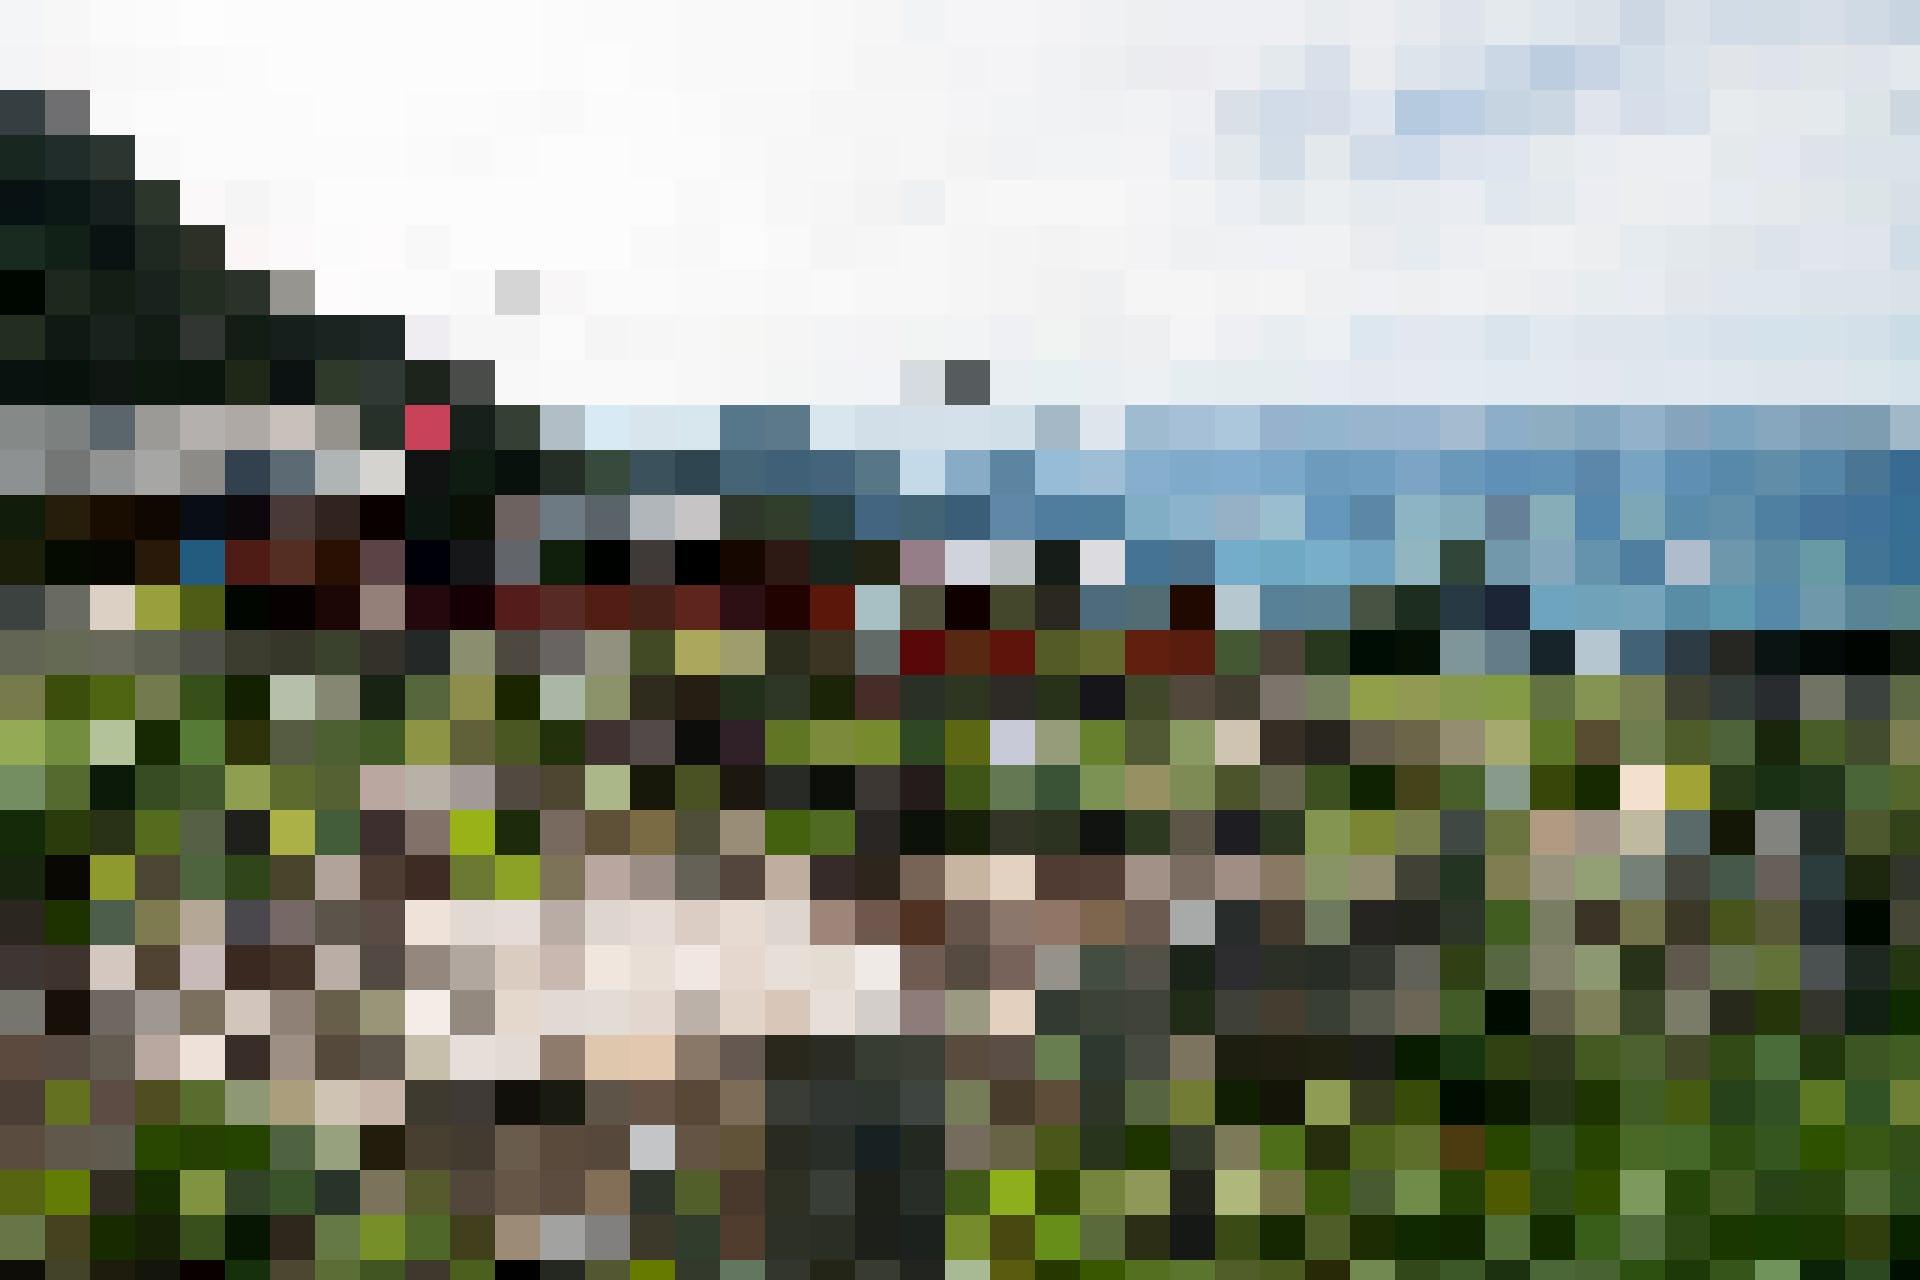 400 Kräuter beherbergt der Kräutergarten des Kräuter Hotel Edelweiss